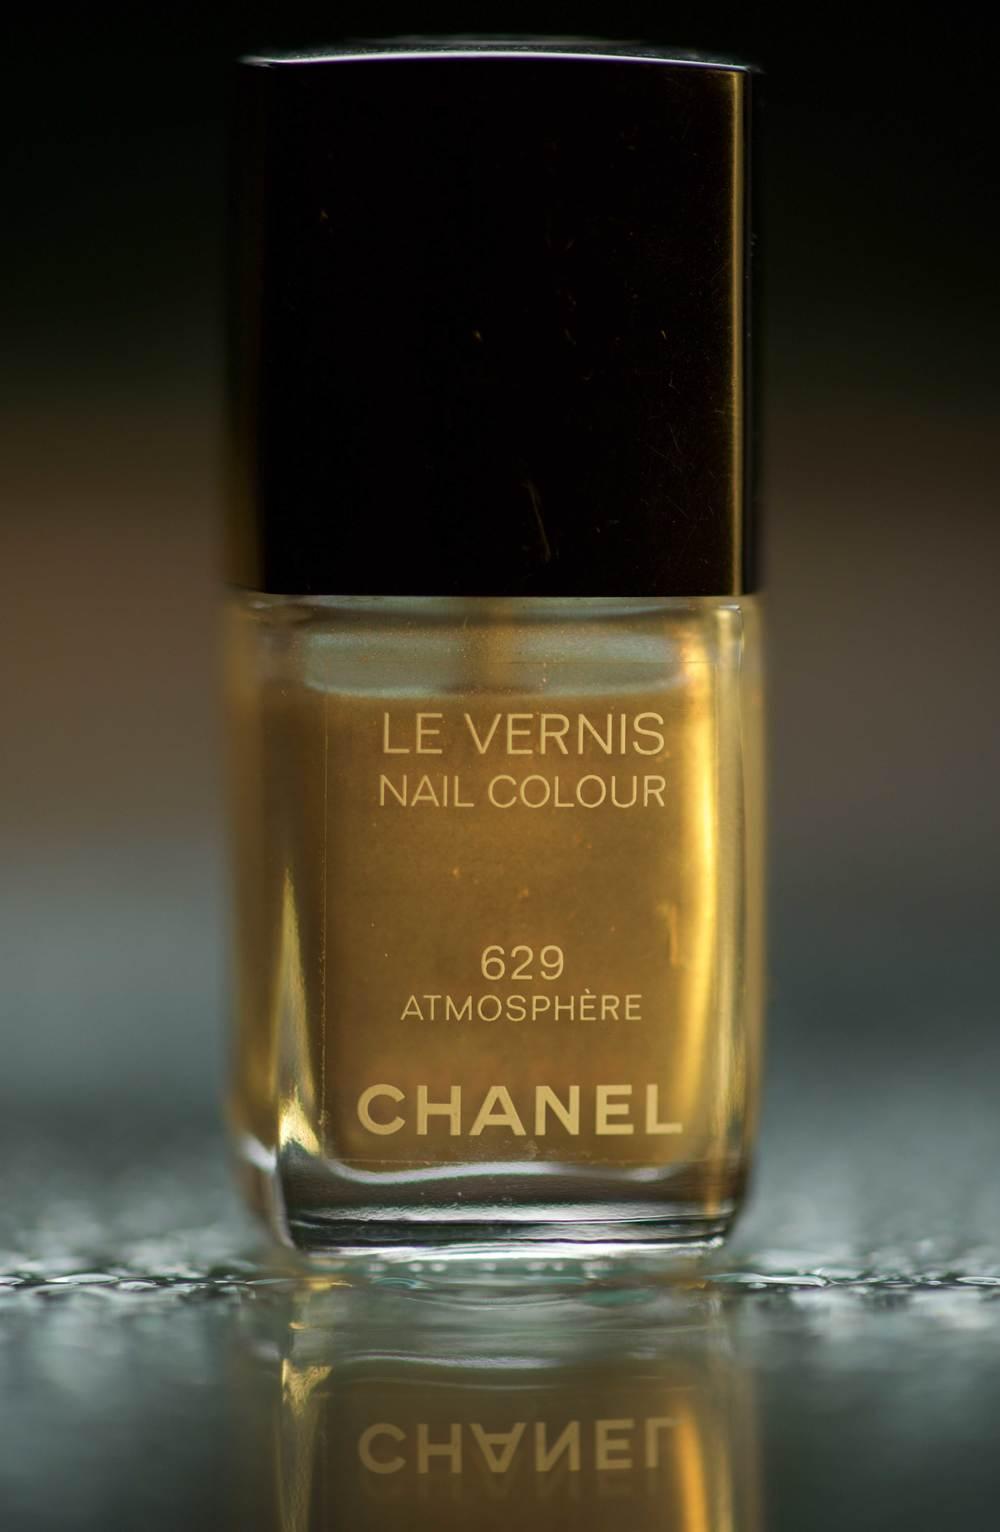 #Chanel Nail Color Le Vernis 629 in golden light, Image©gunjanvirk